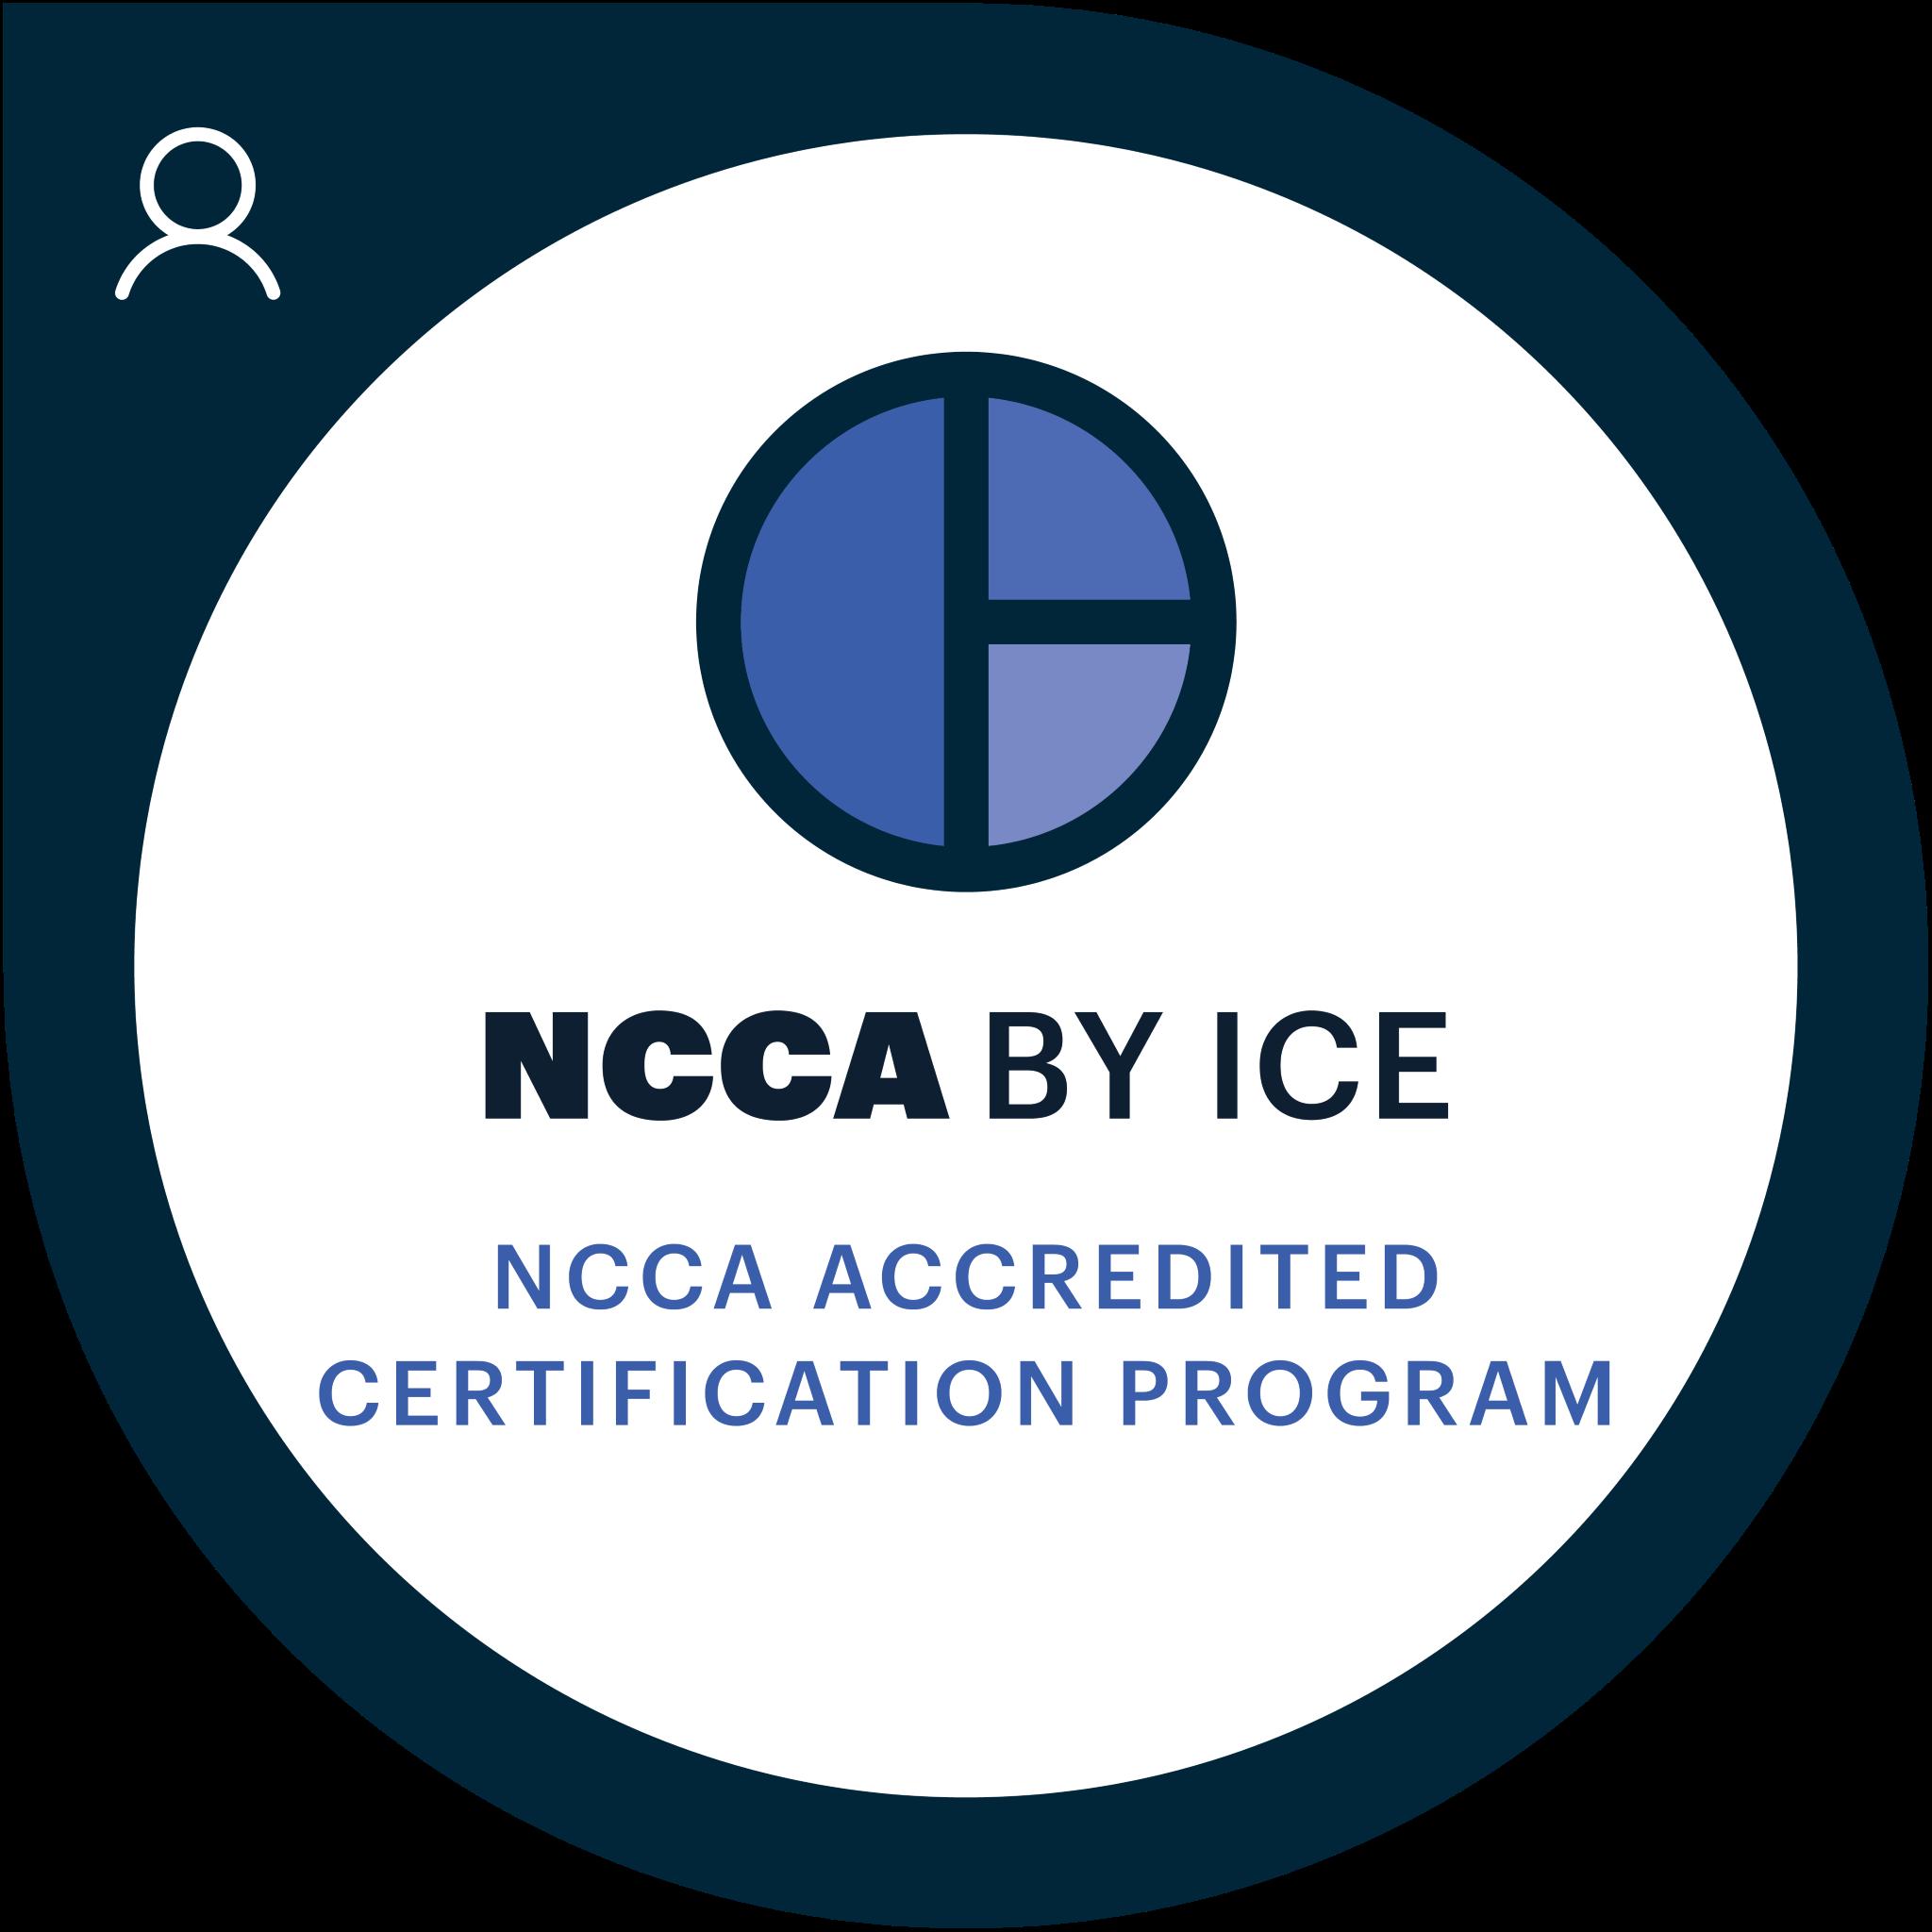 NCCA Accredited Program